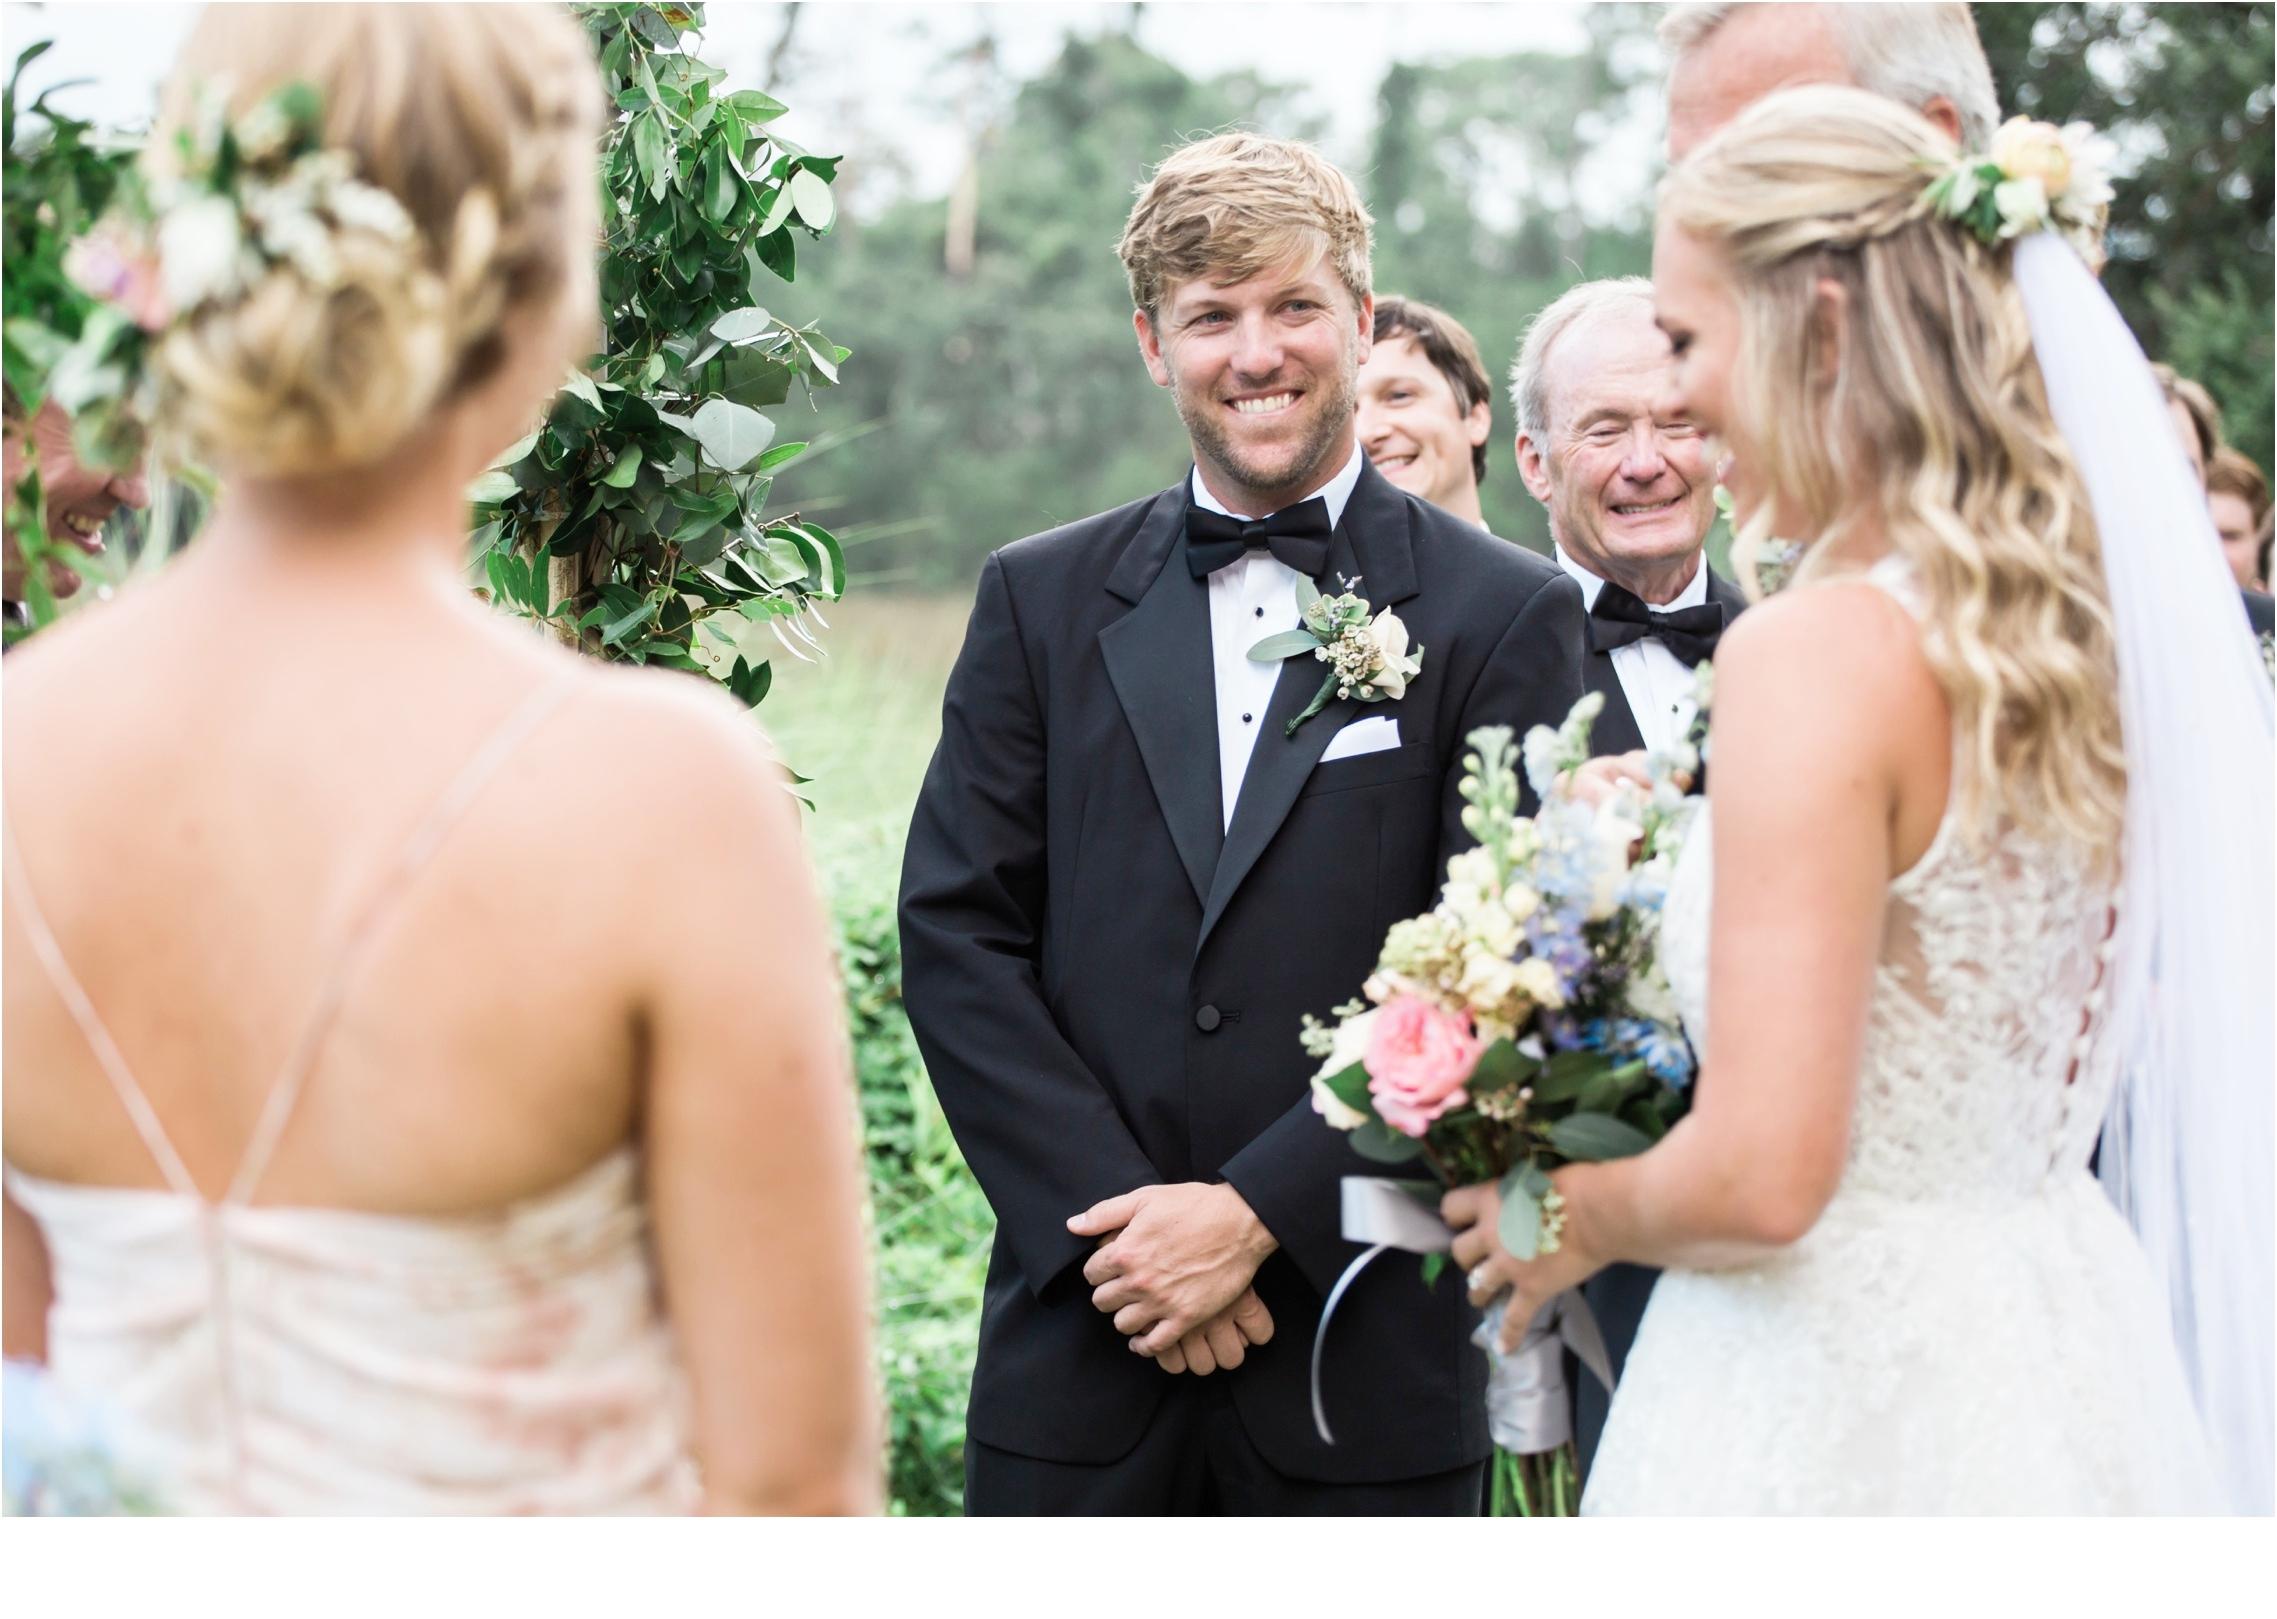 Rainey_Gregg_Photography_St._Simons_Island_Georgia_California_Wedding_Portrait_Photography_0071.jpg